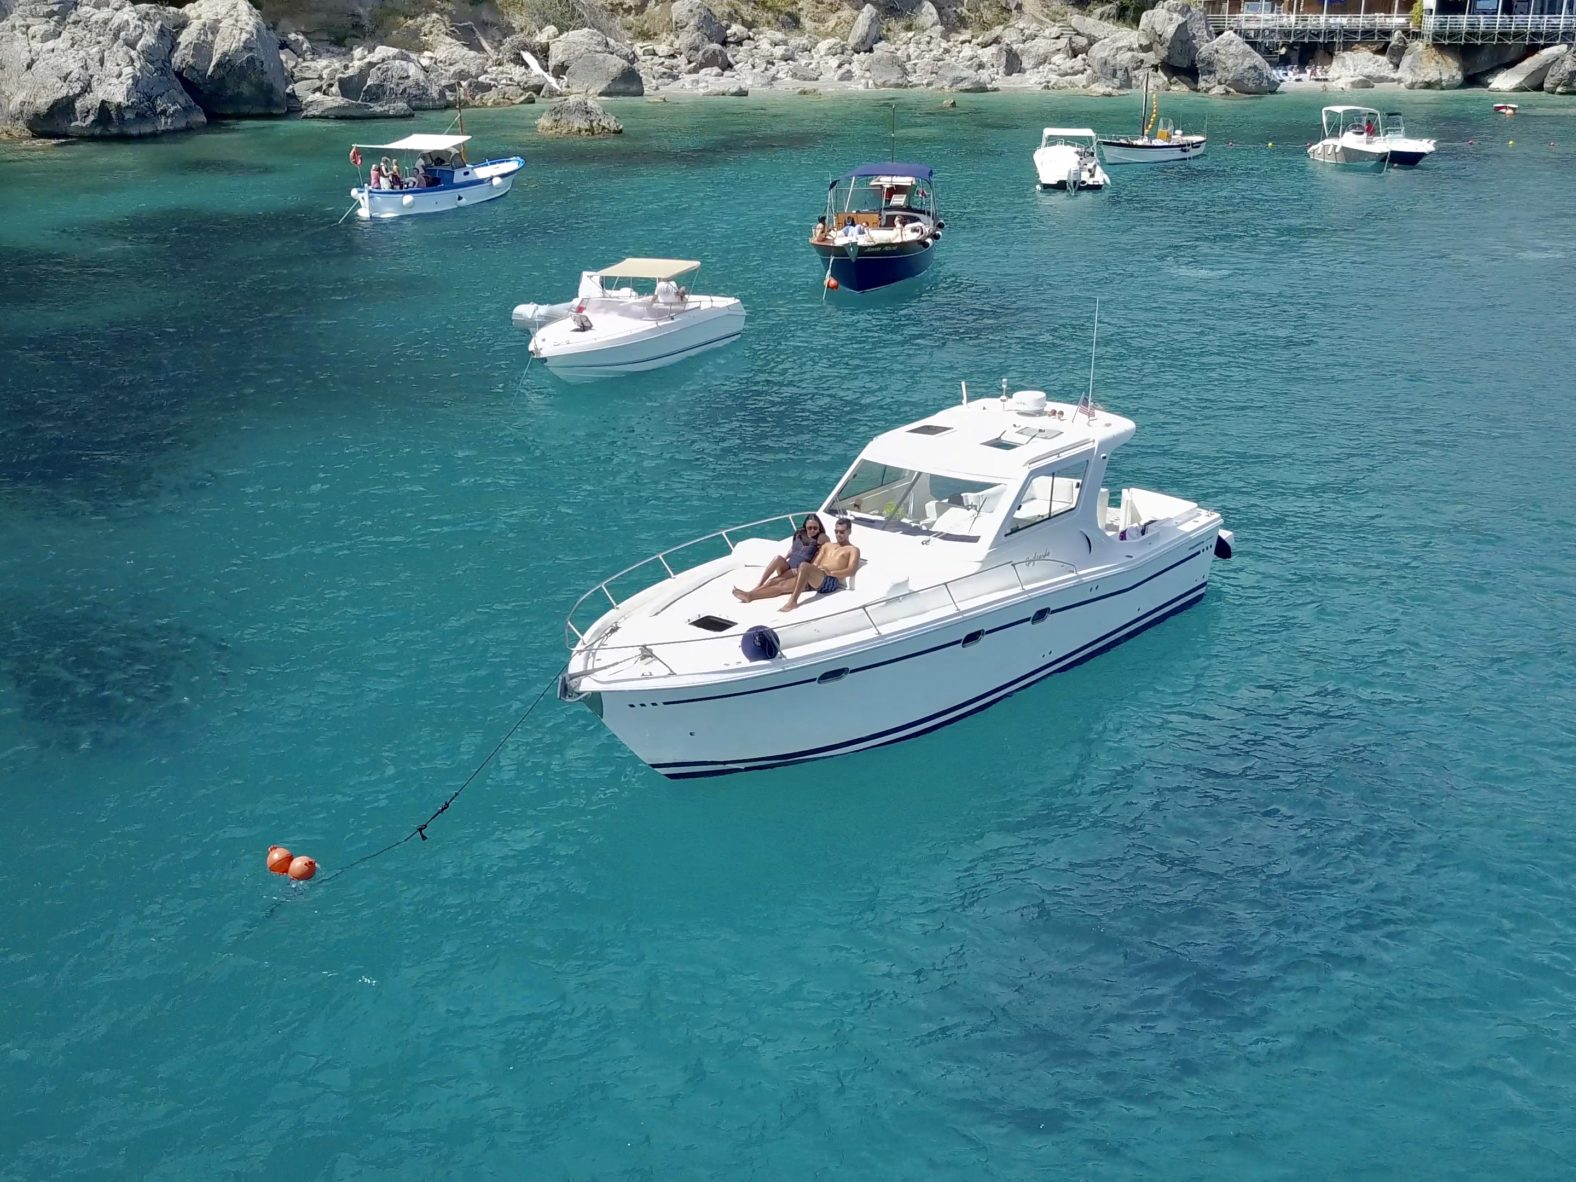 Matt & Kerstin on a Boat in Isle of Capri Italy